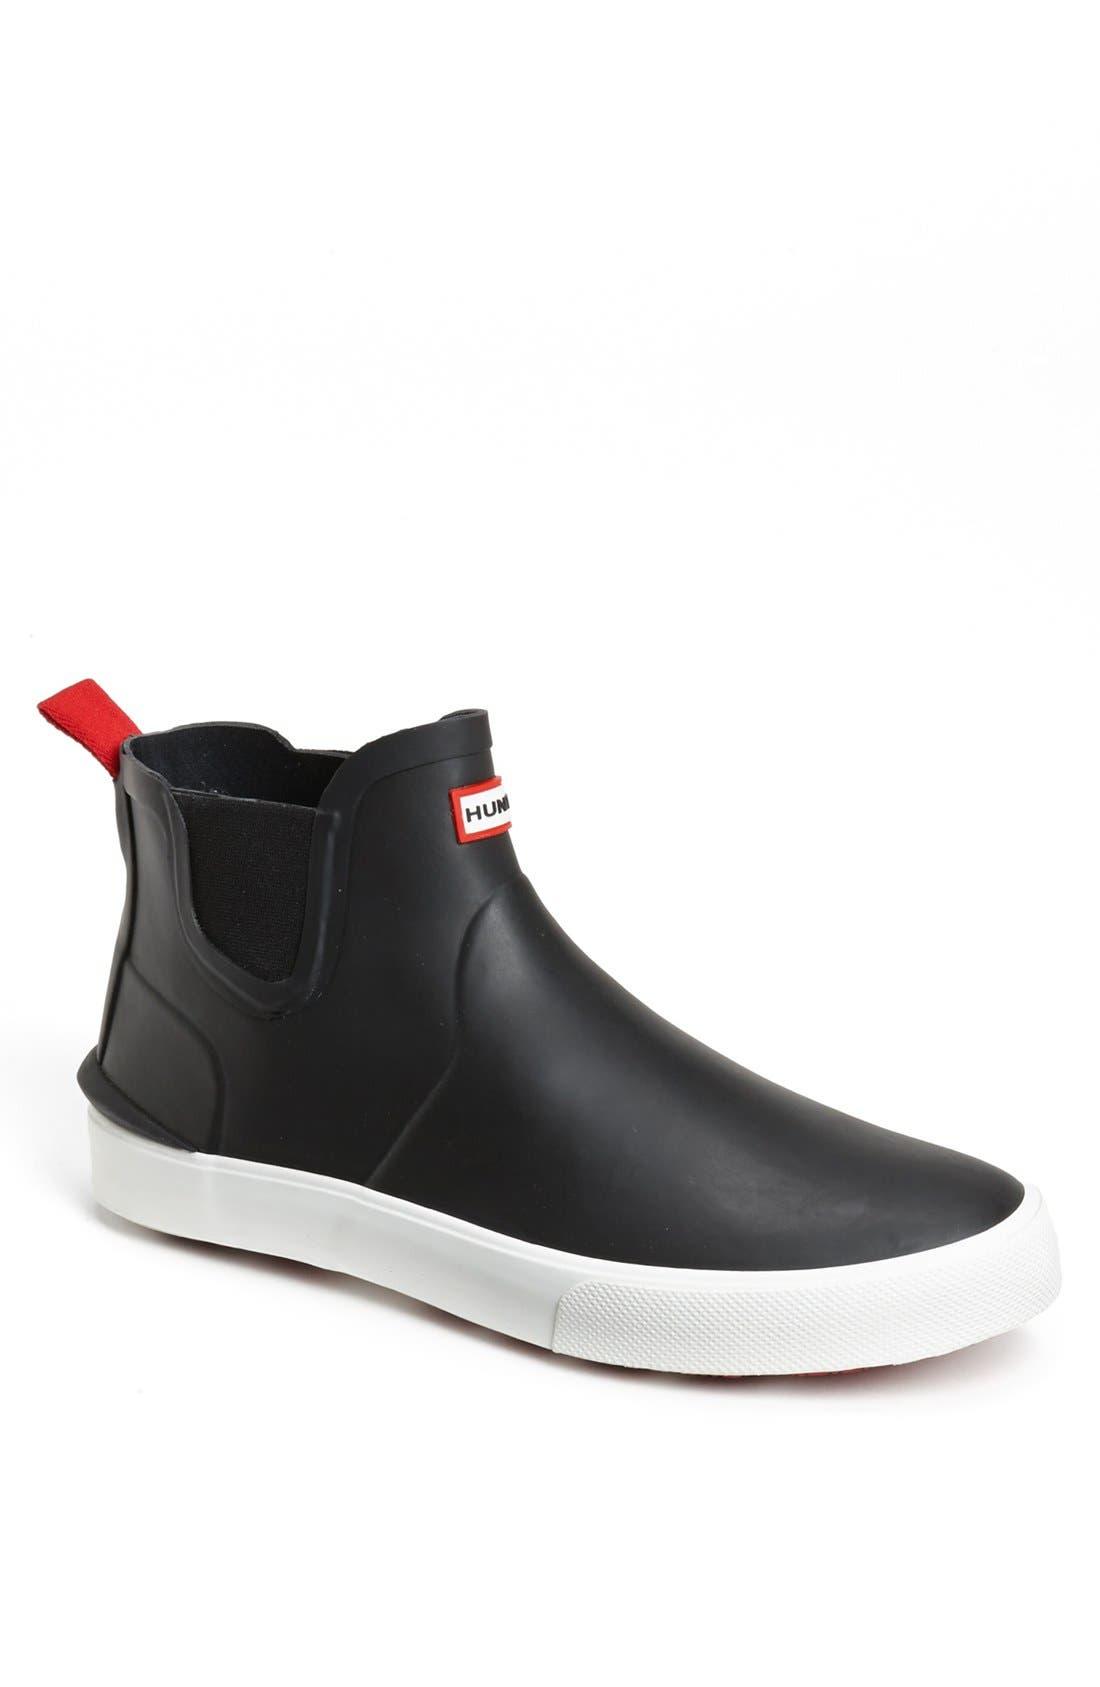 HUNTER 'Daleton' Boot, Main, color, 019